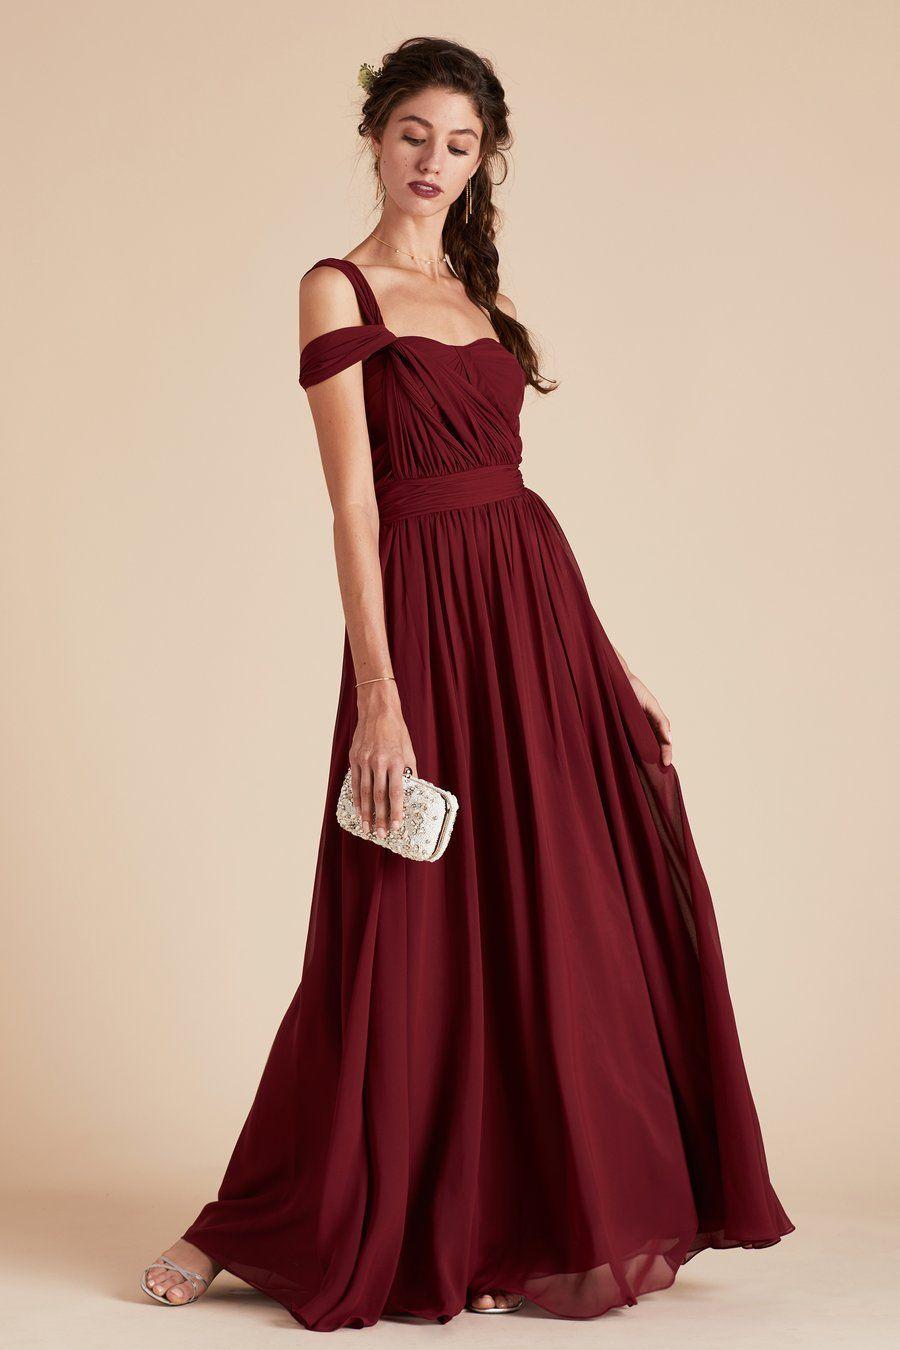 c8359dadb09 Gracie Convertible Bridesmaid Dress in Chiffon burgundy by Birdy Grey.  Under  100